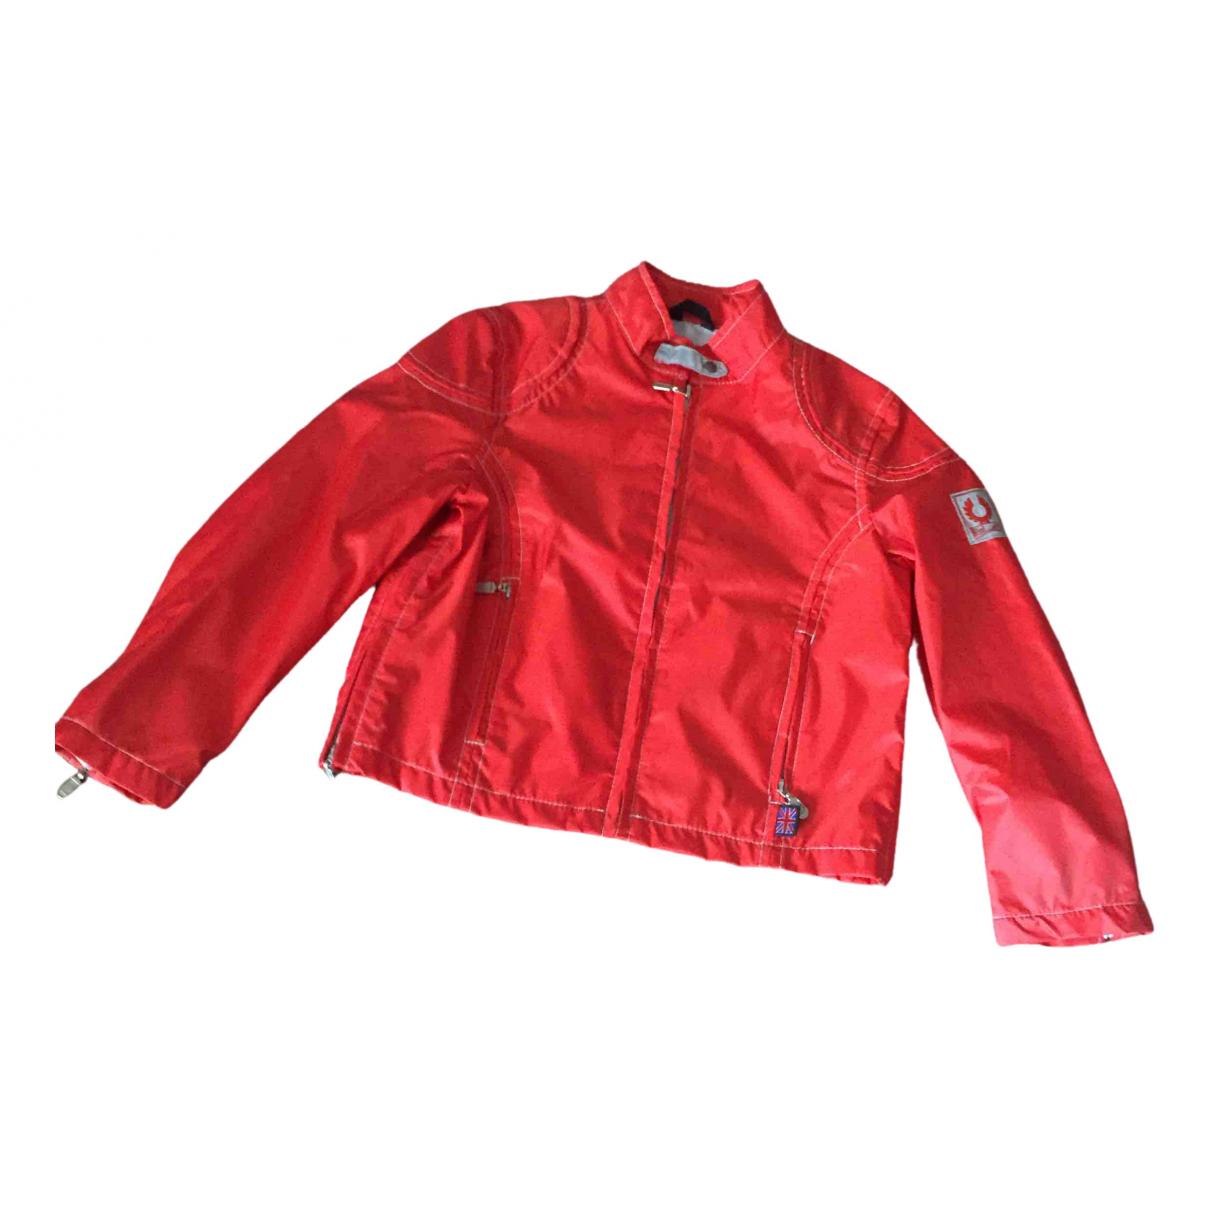 Abrigo, Chaqueta en Poliester Rojo Belstaff